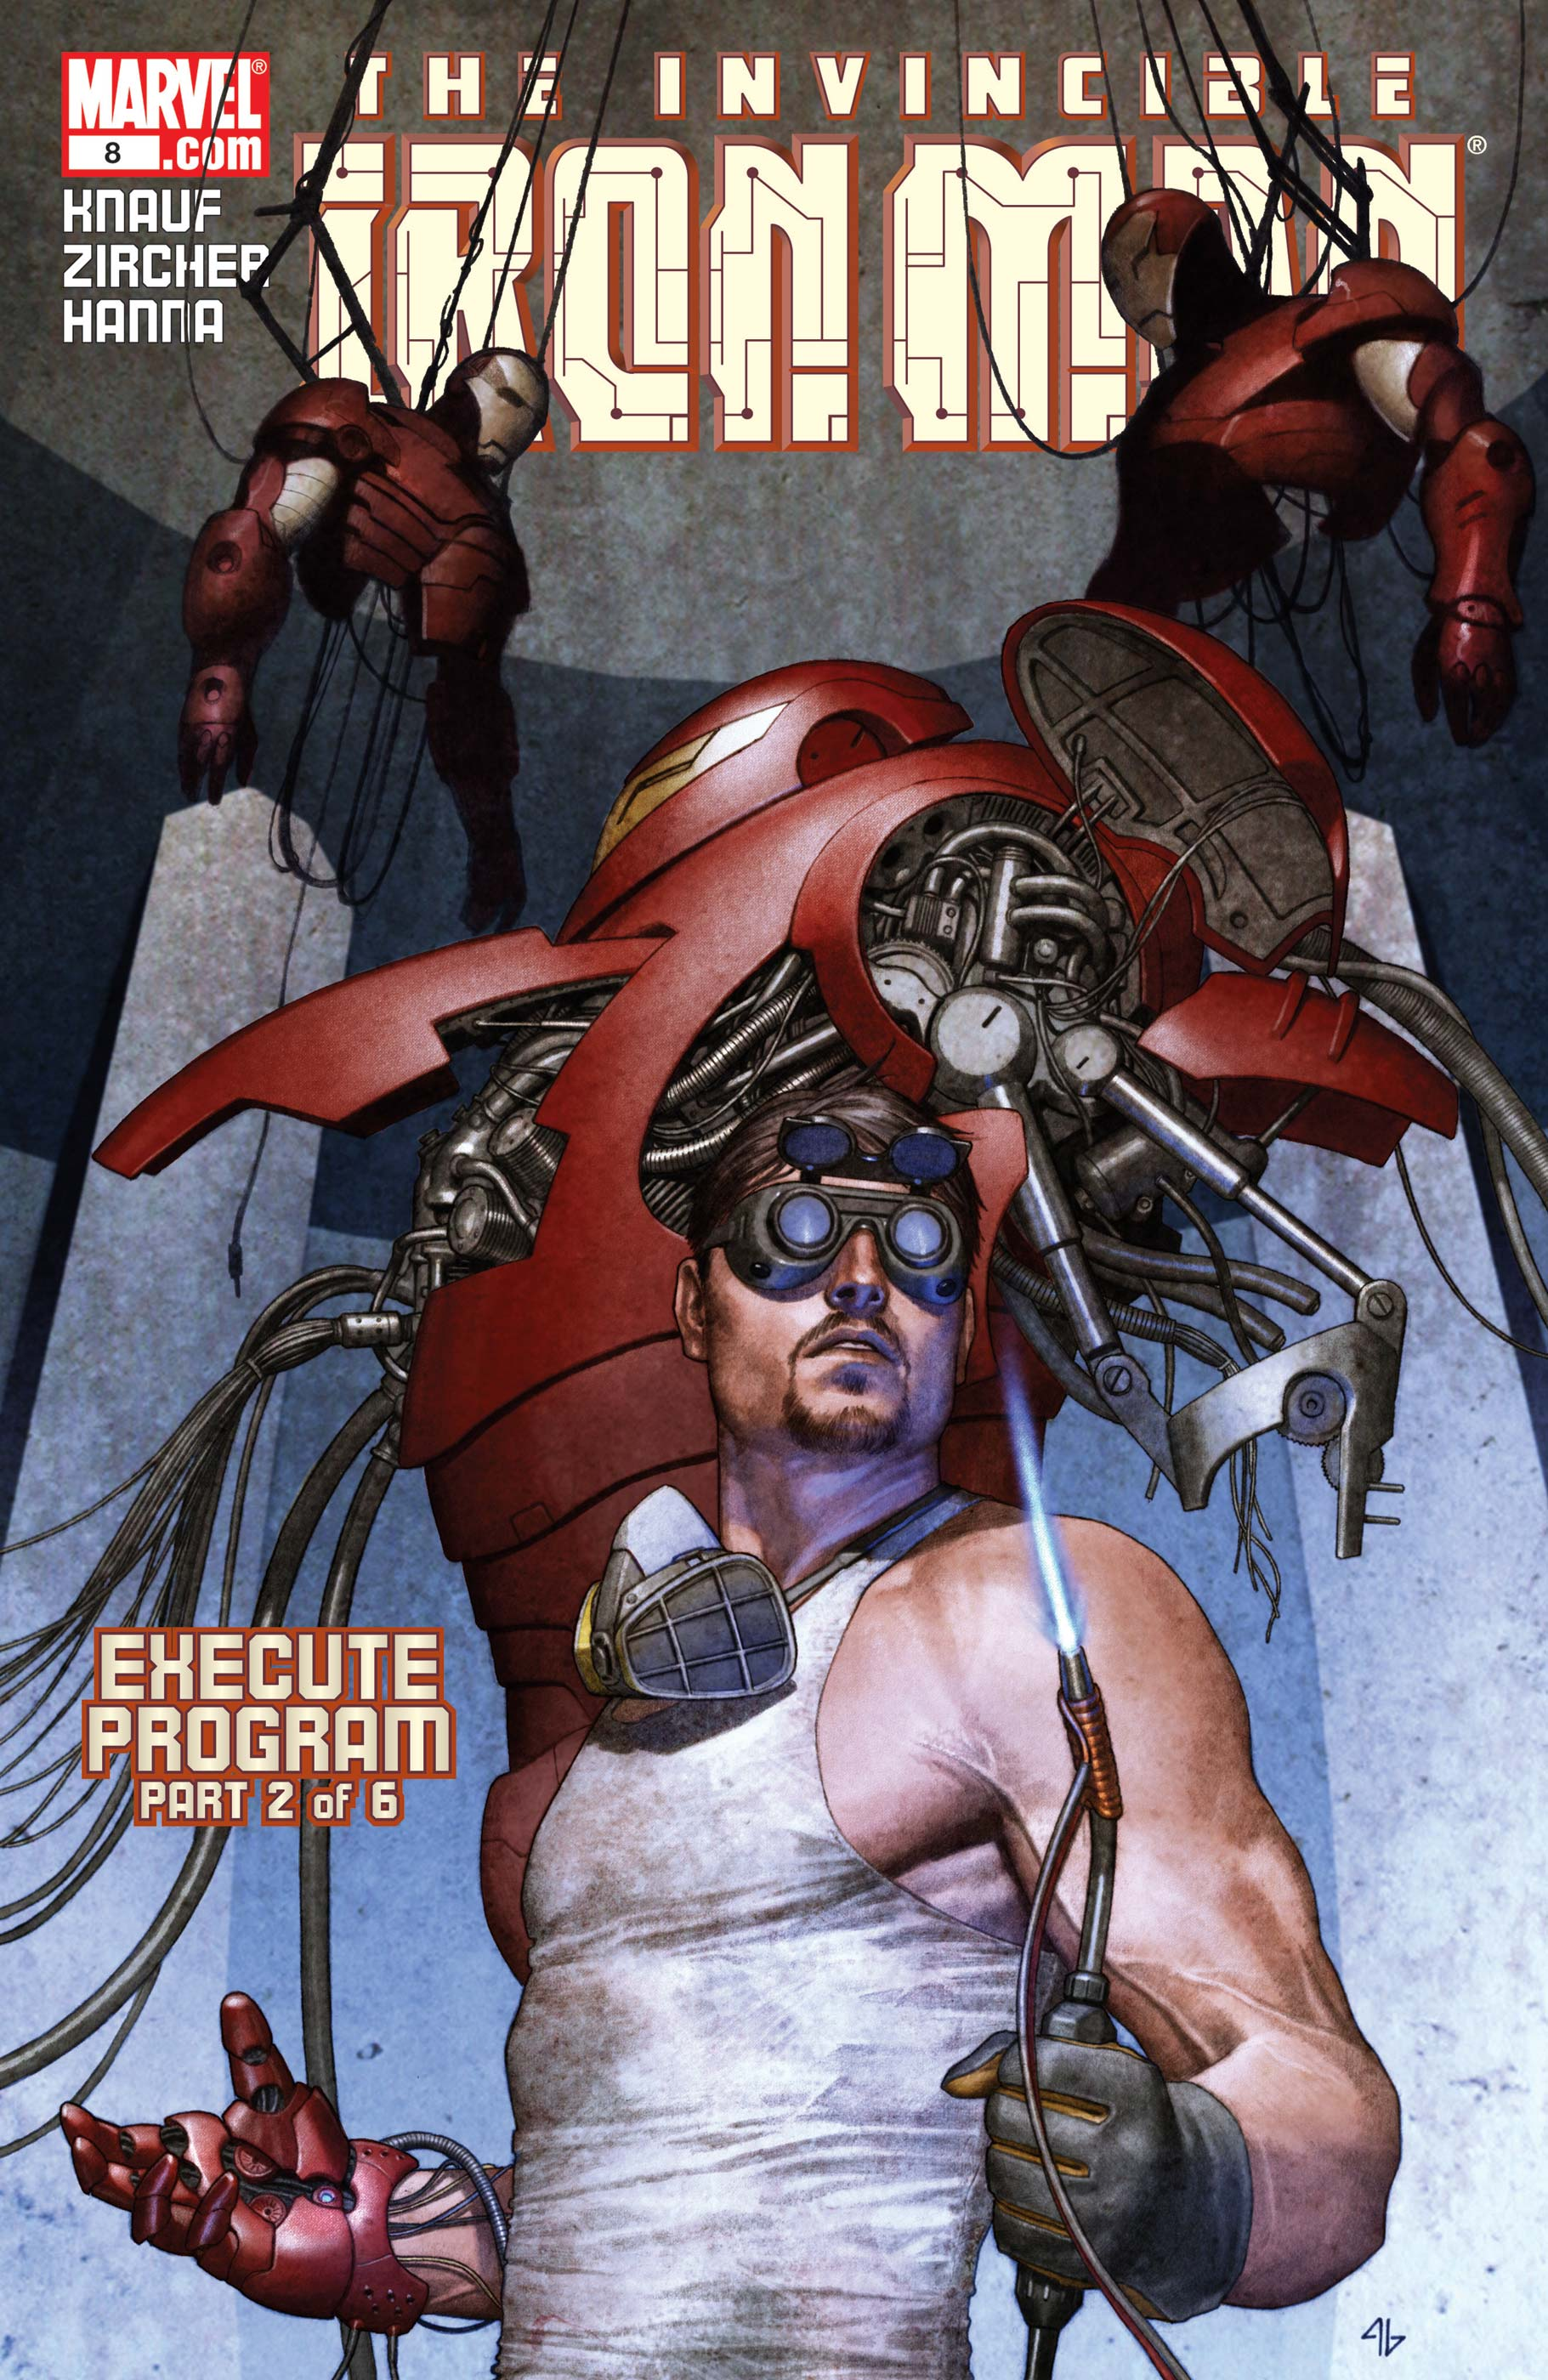 The Invincible Iron Man (2004) #8